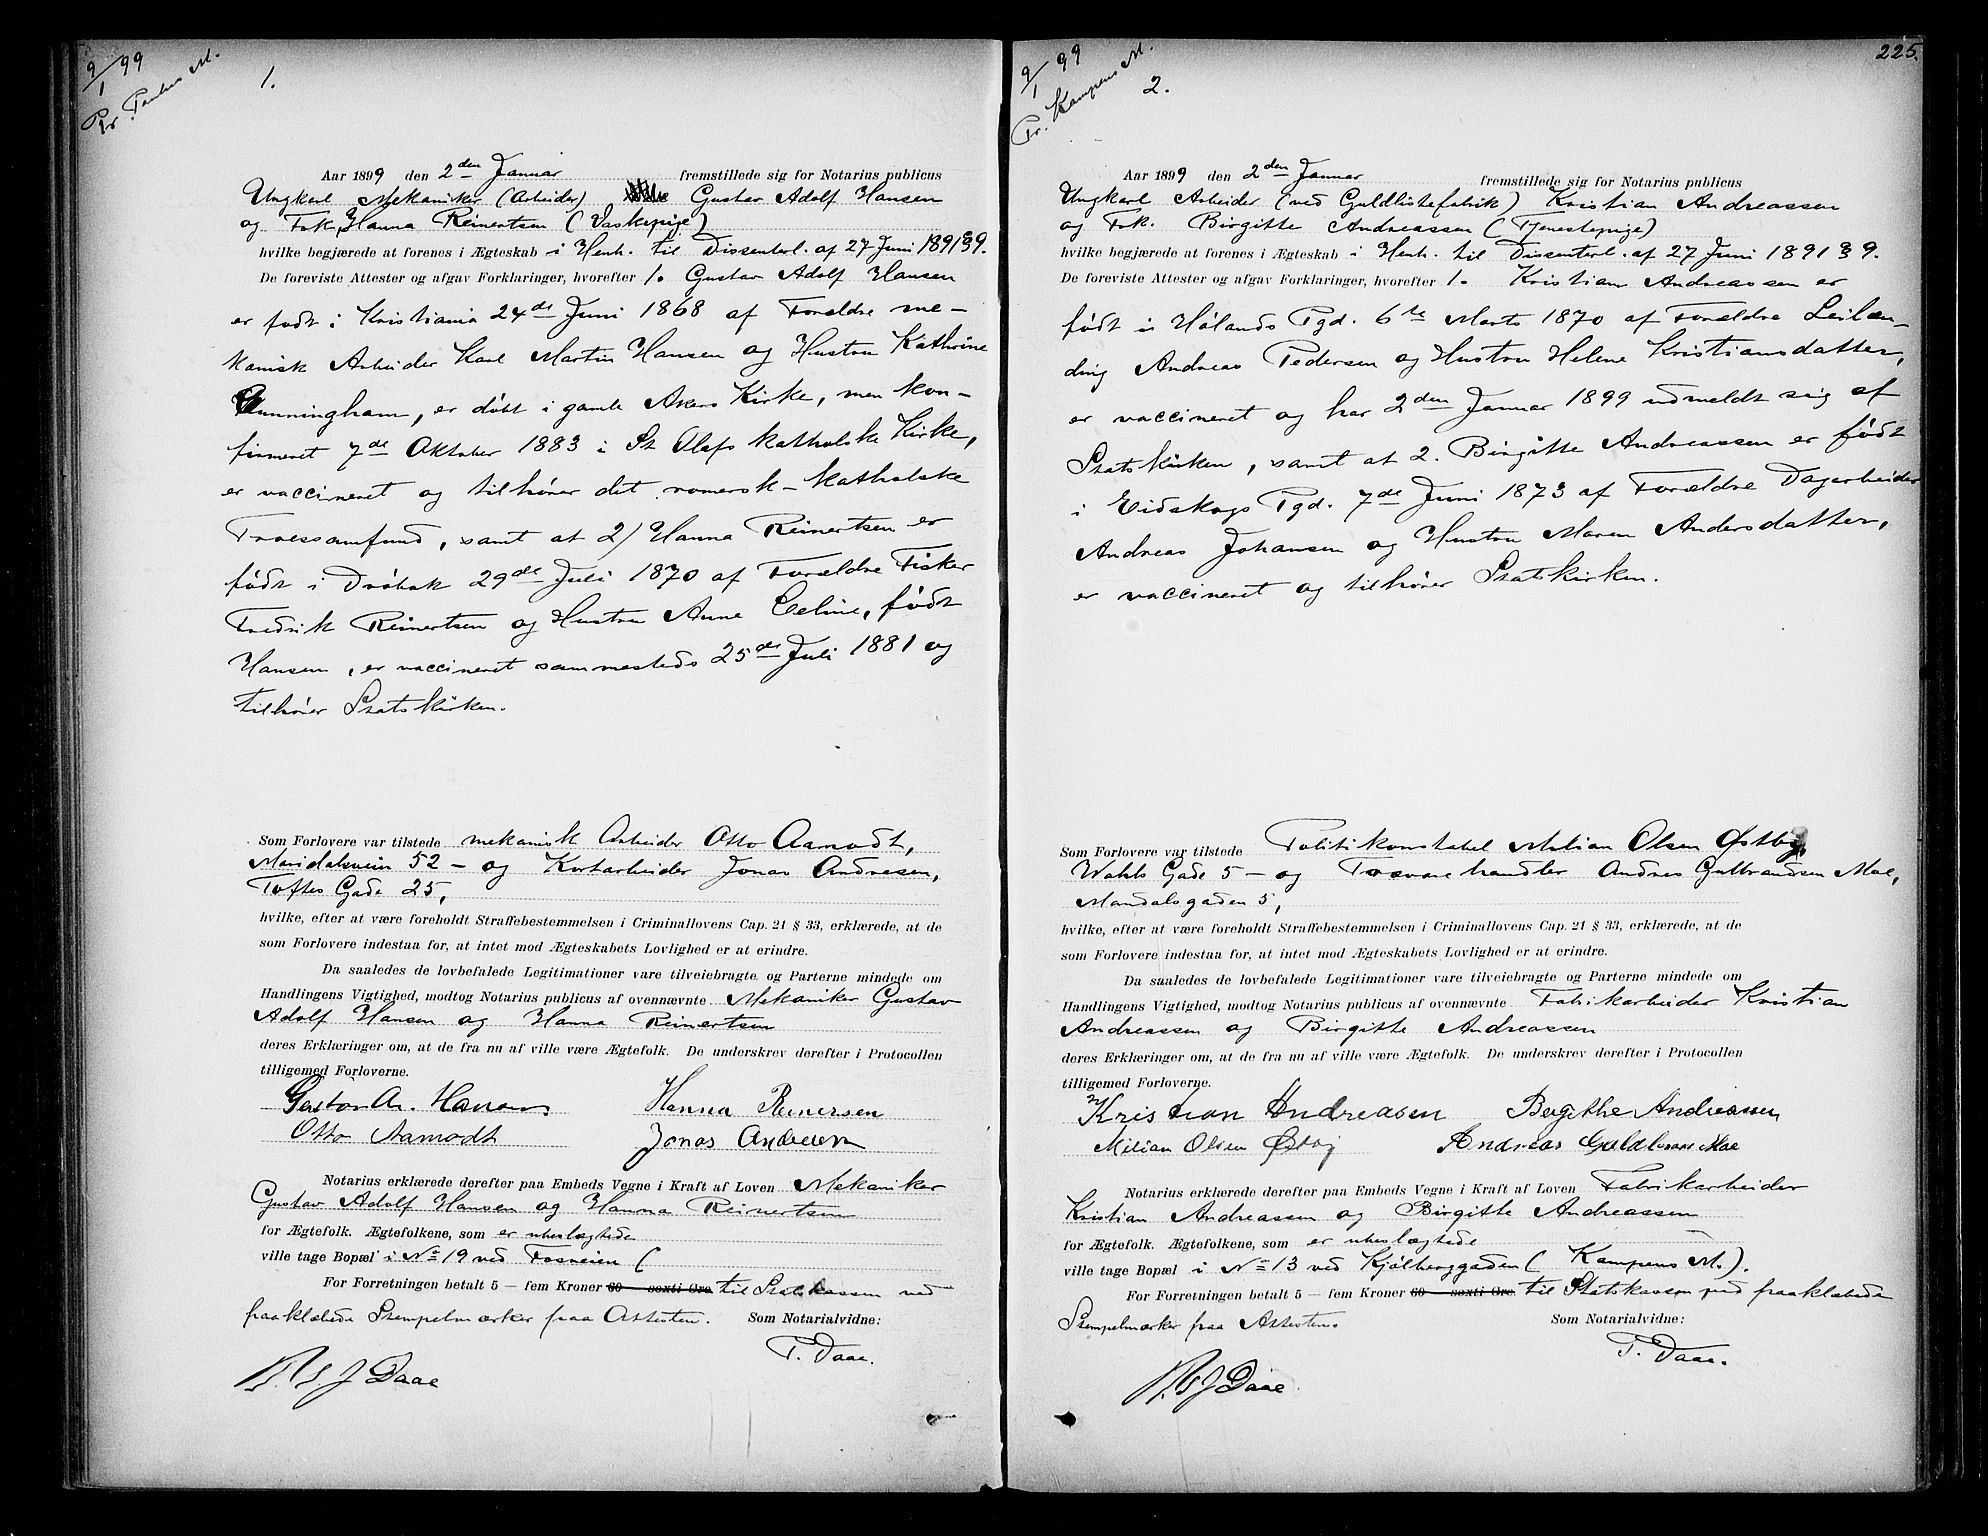 SAO, Oslo byfogd avd. I, L/Lb/Lbb/L0004: Notarialprotokoll, rekke II: Vigsler, 1897-1902, s. 224b-225a